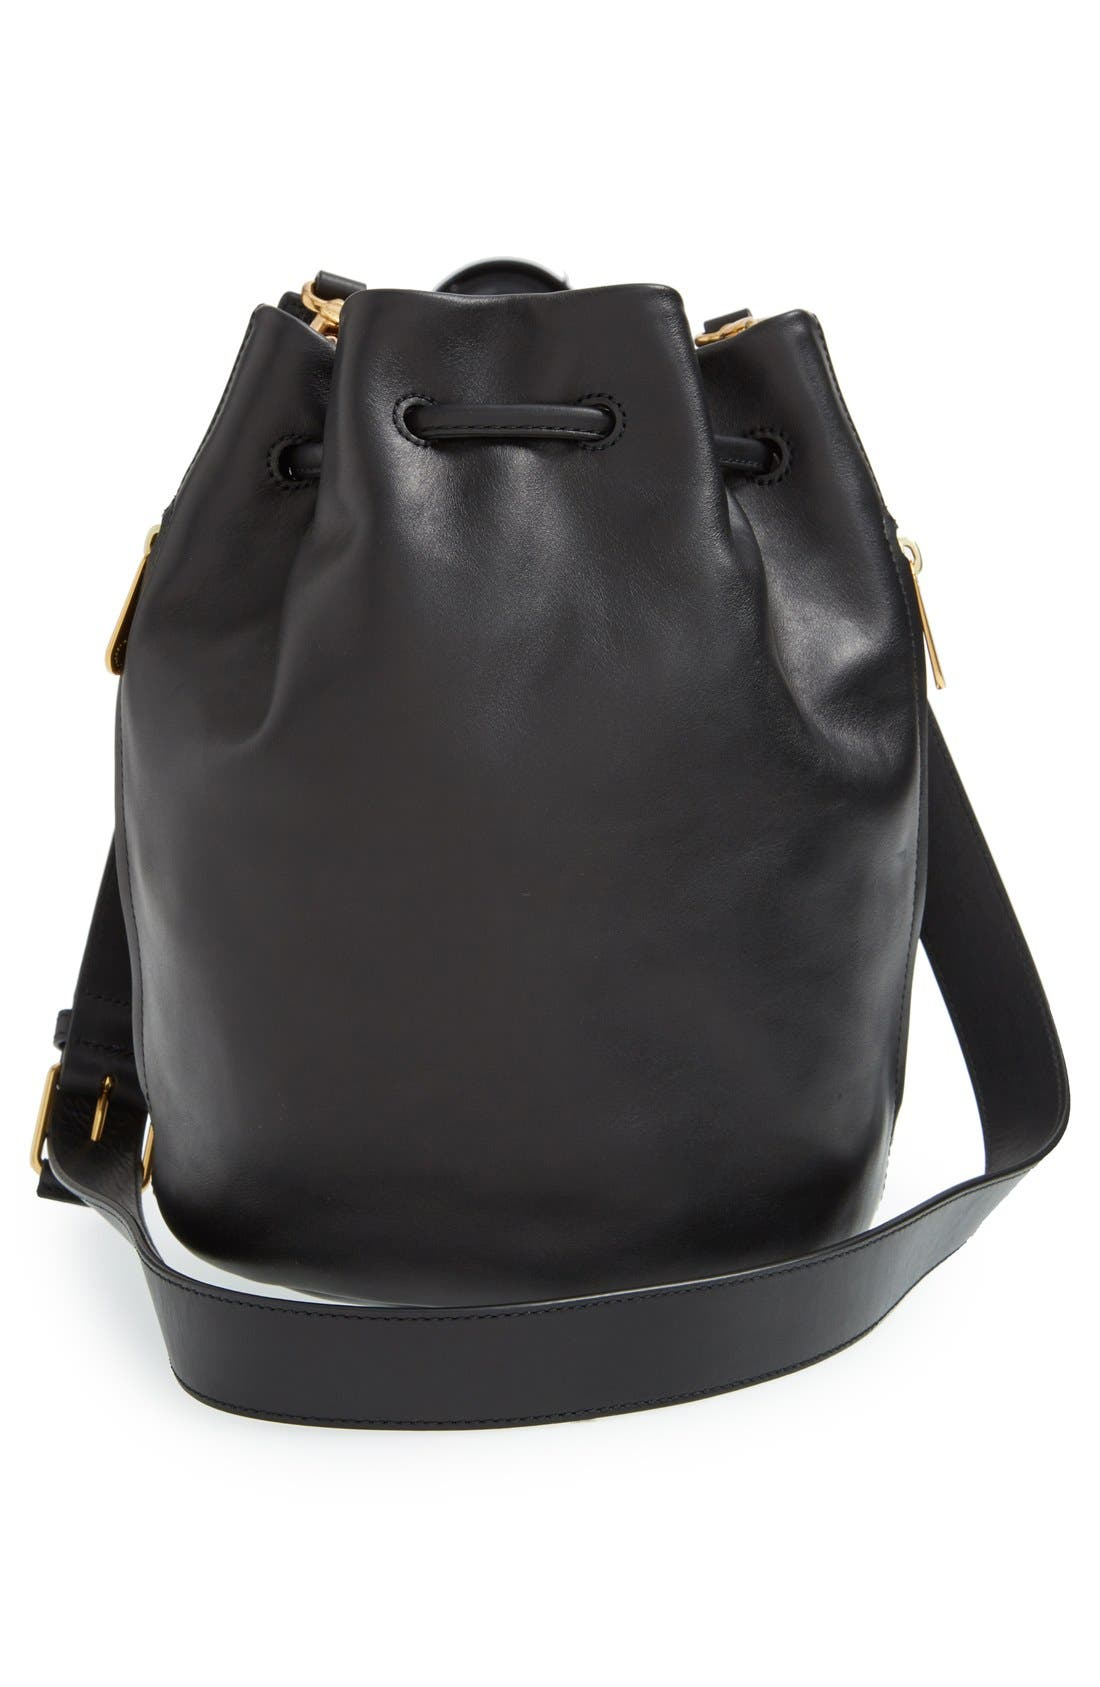 Alternate Image 3  - MARC BY MARC JACOBS 'Luna' Leather Drawstring Bucket Bag